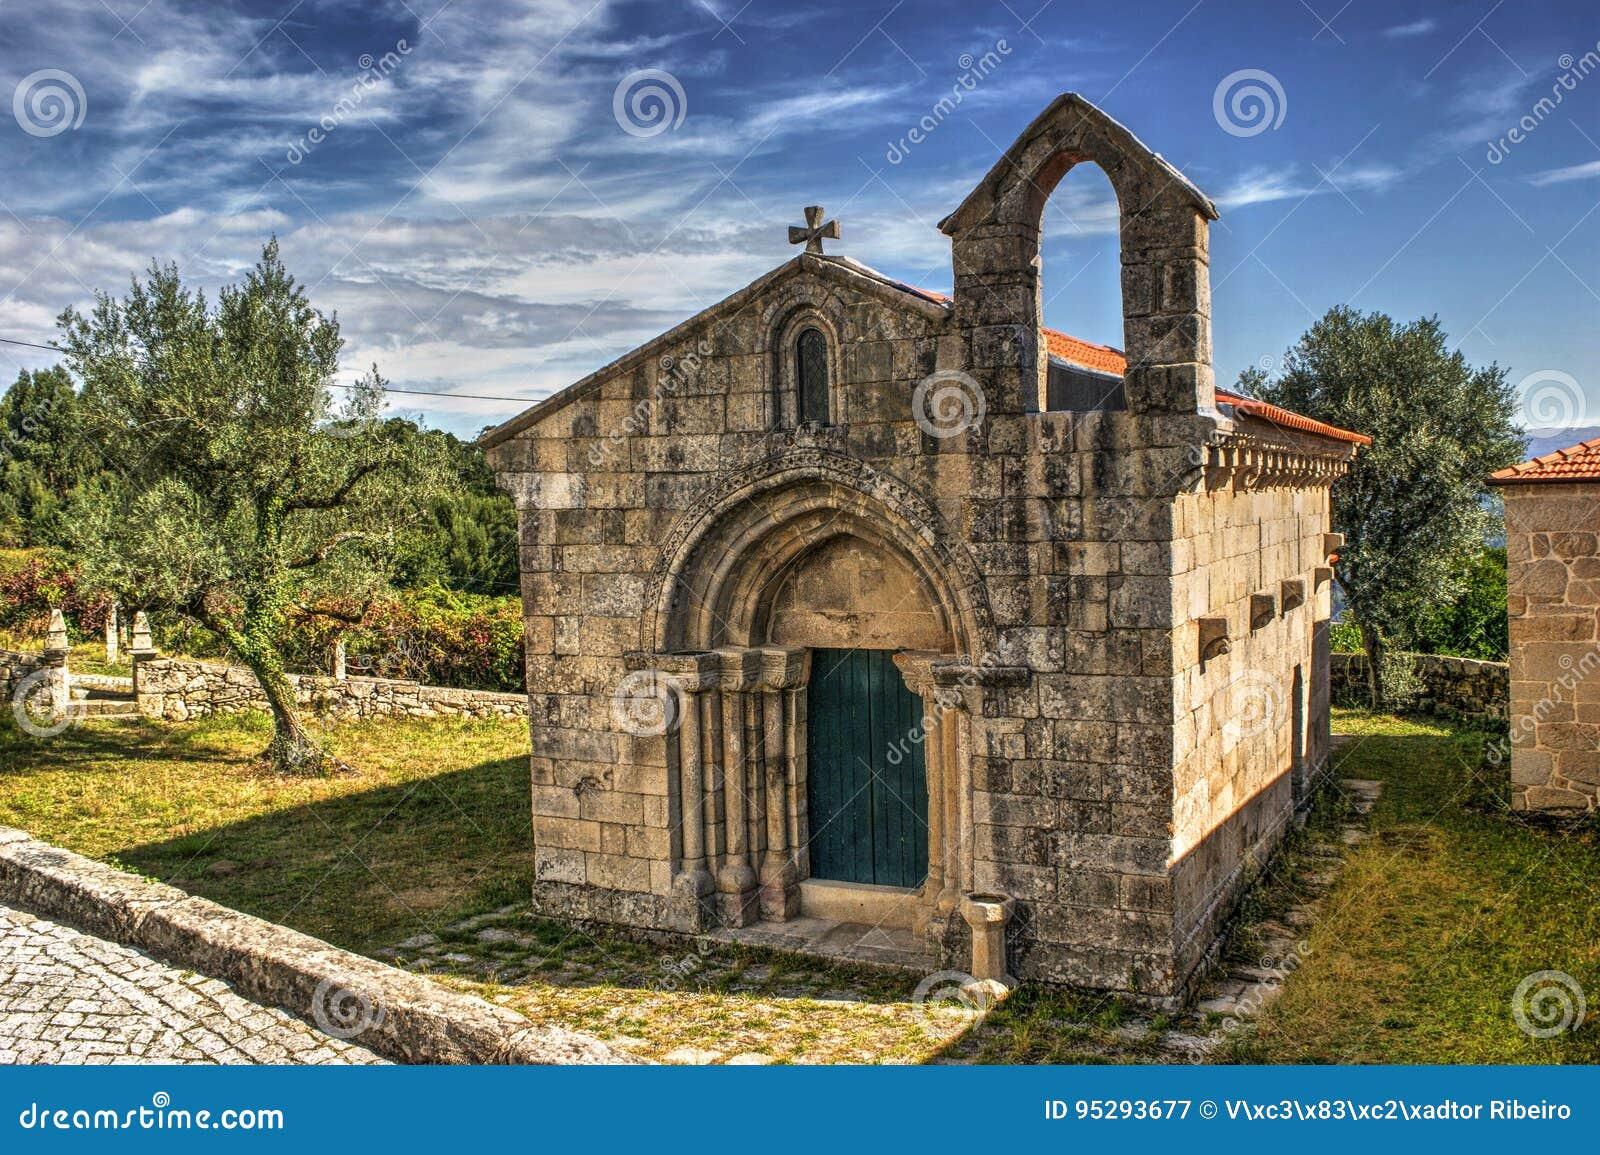 Romanesque church of Boelhe in Penafiel